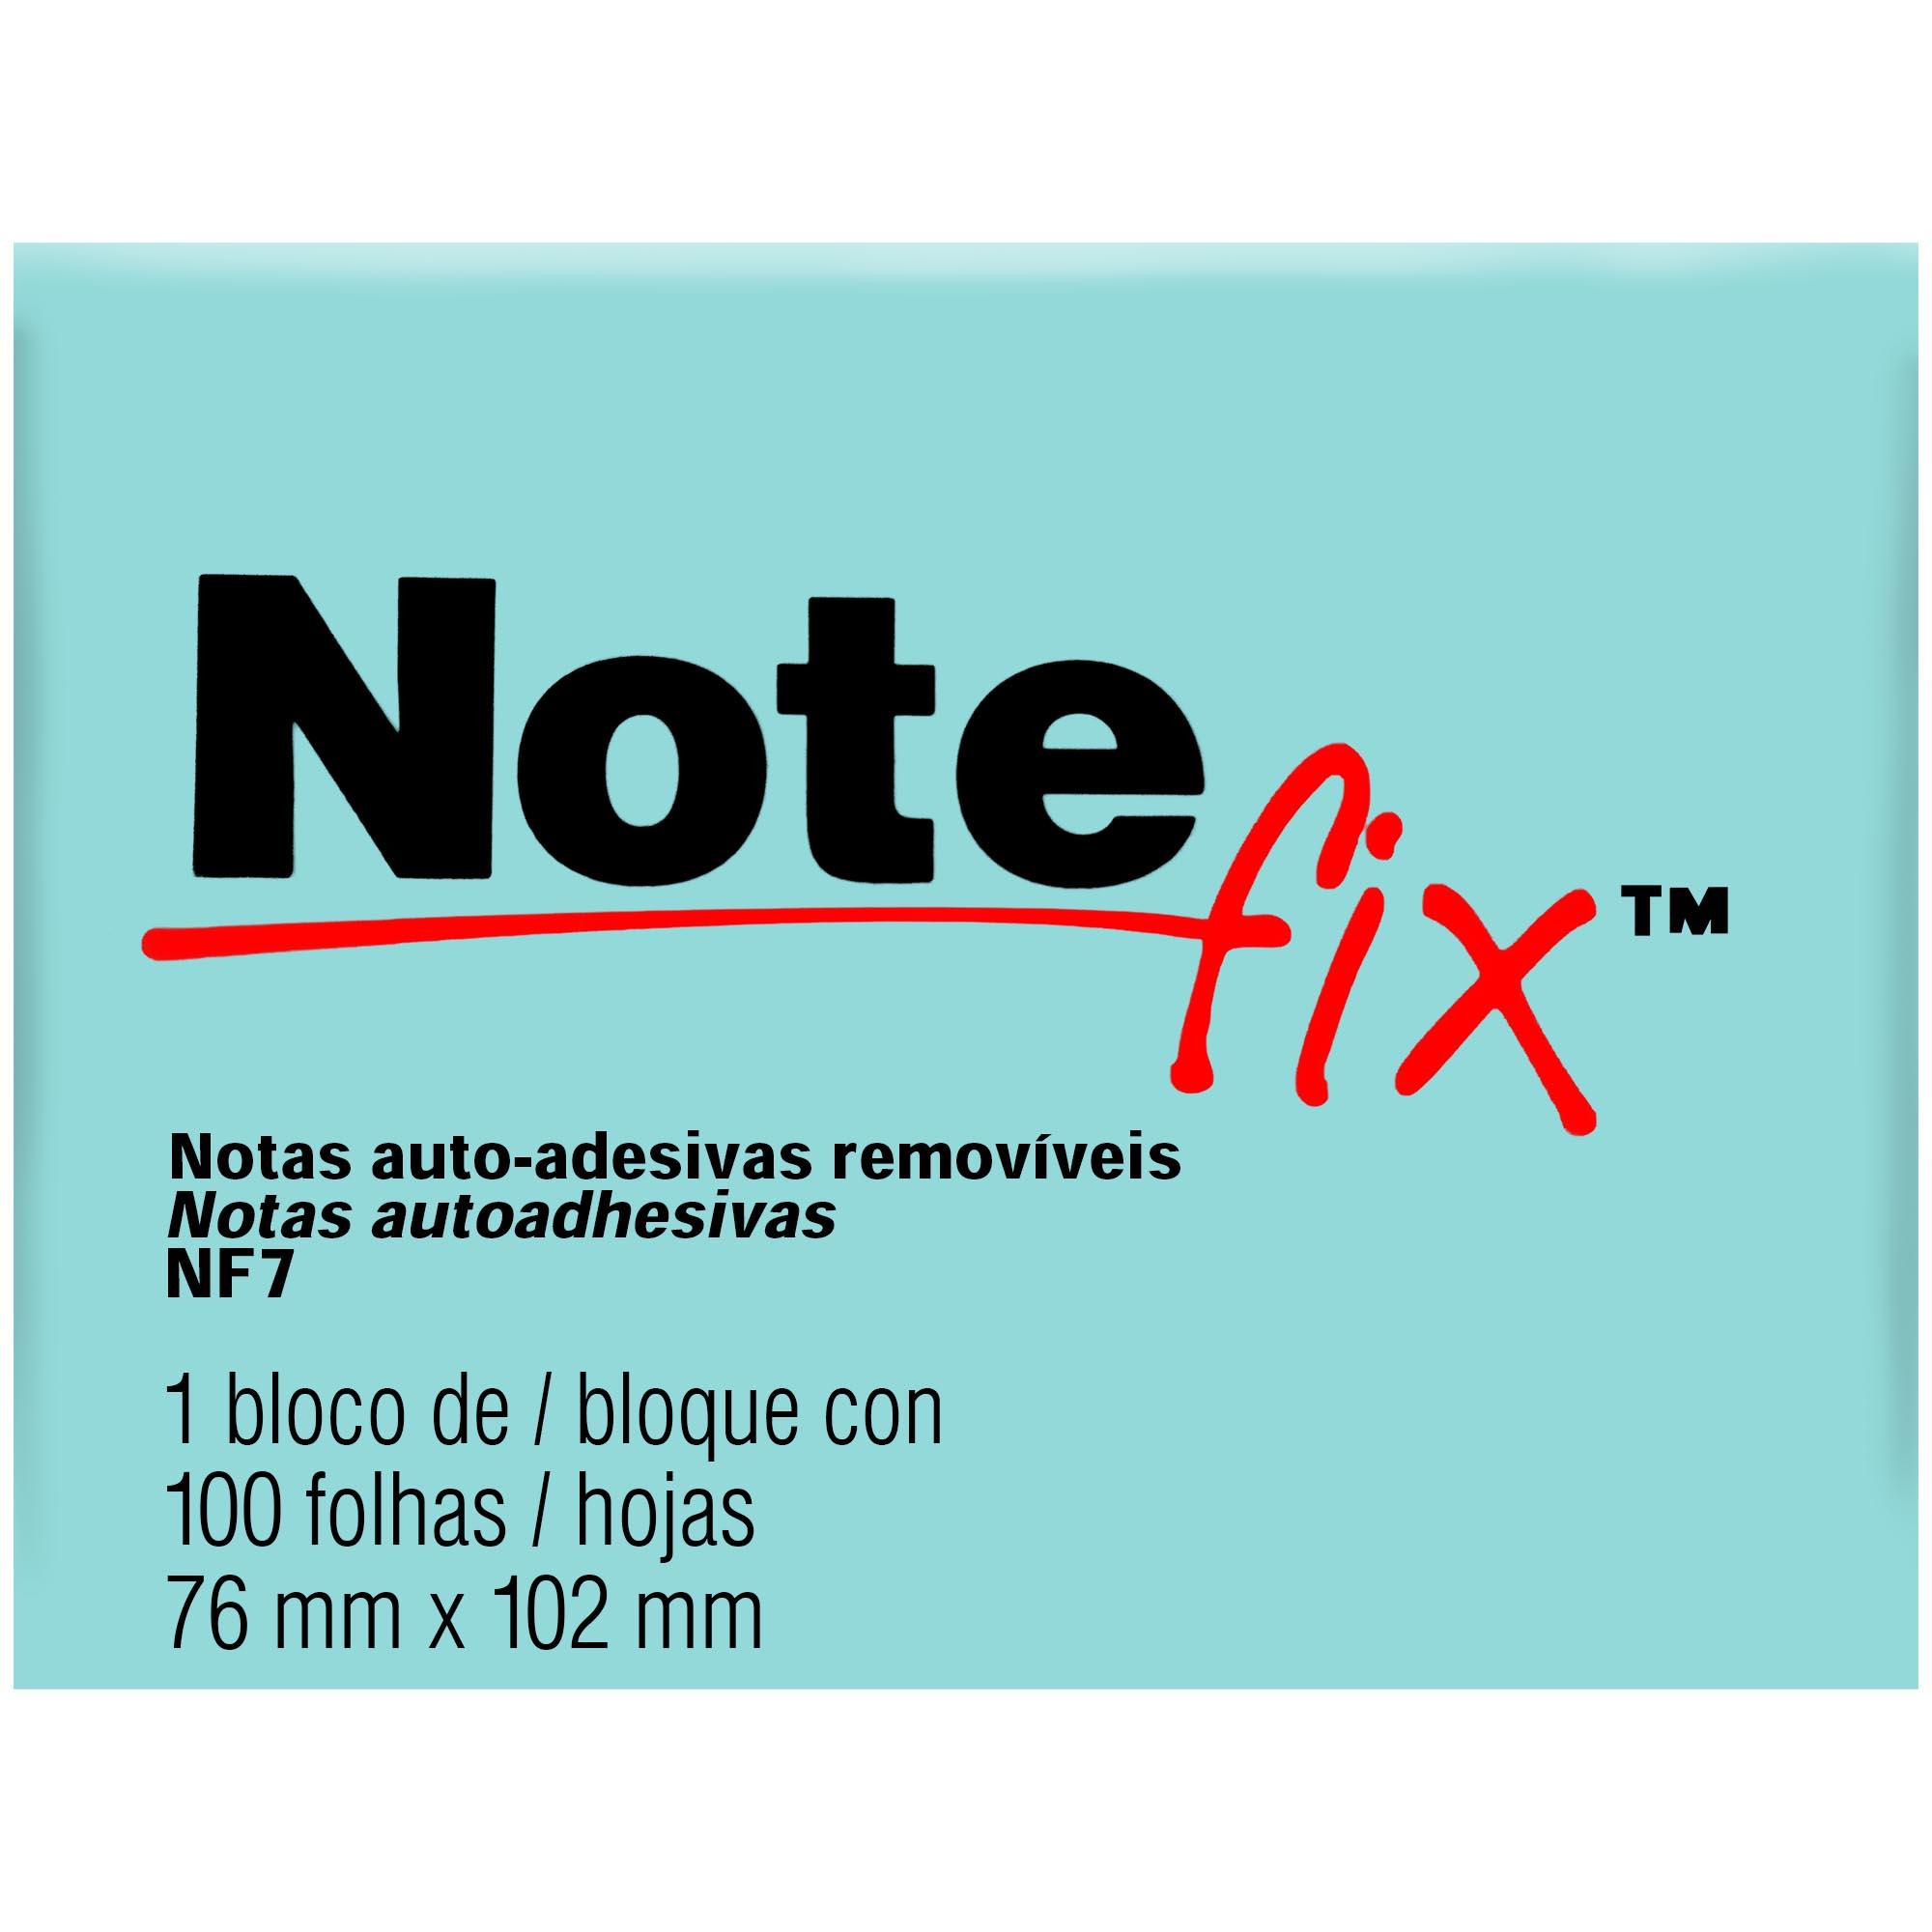 Bloco Autoadesivo Notefix NFX7 76MMX102MM 100FLS Cor Azul HB004116115 - 3M